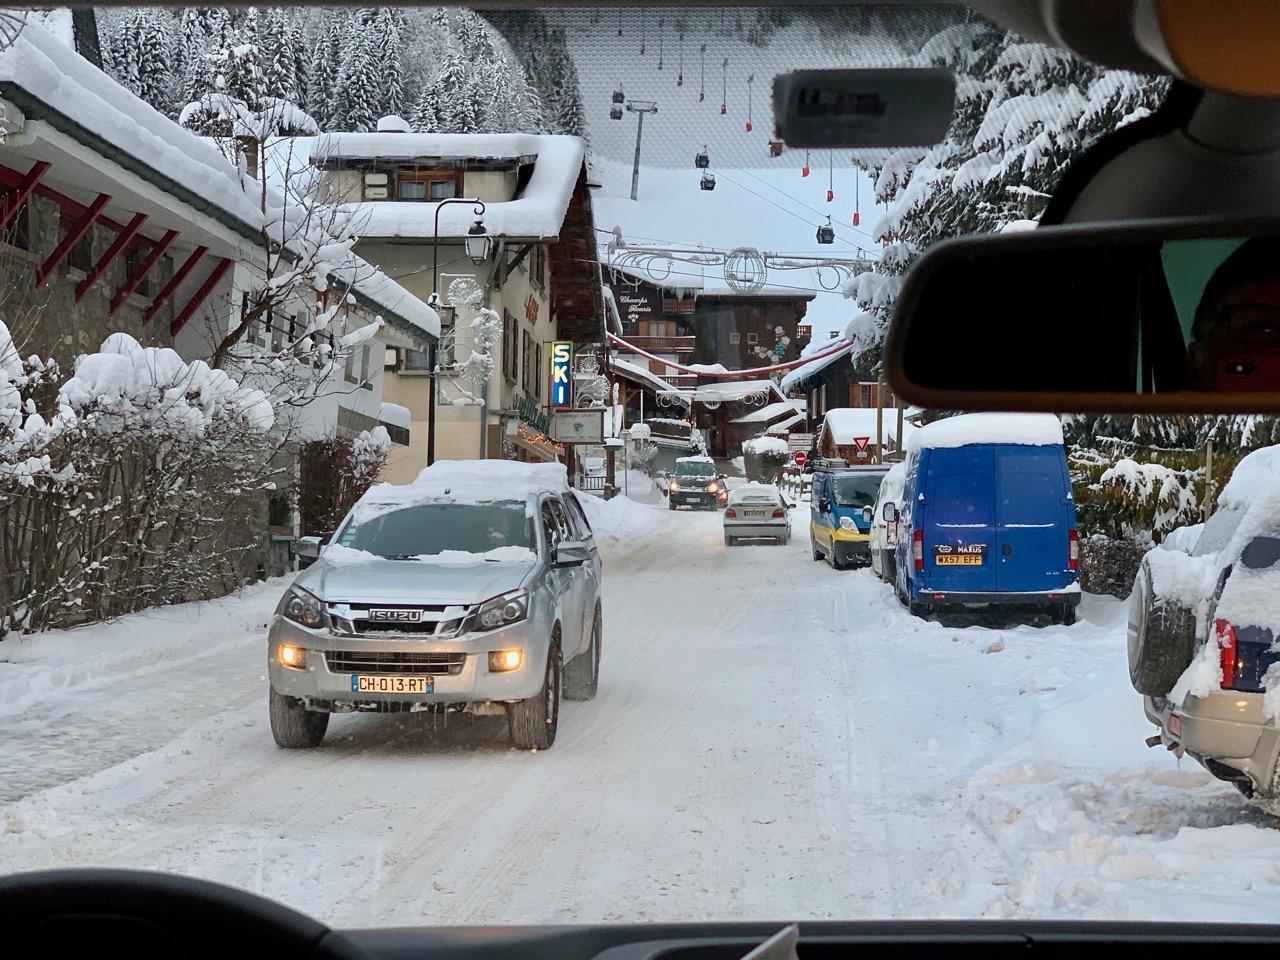 2019 01 31 seytroux snow 04 1280